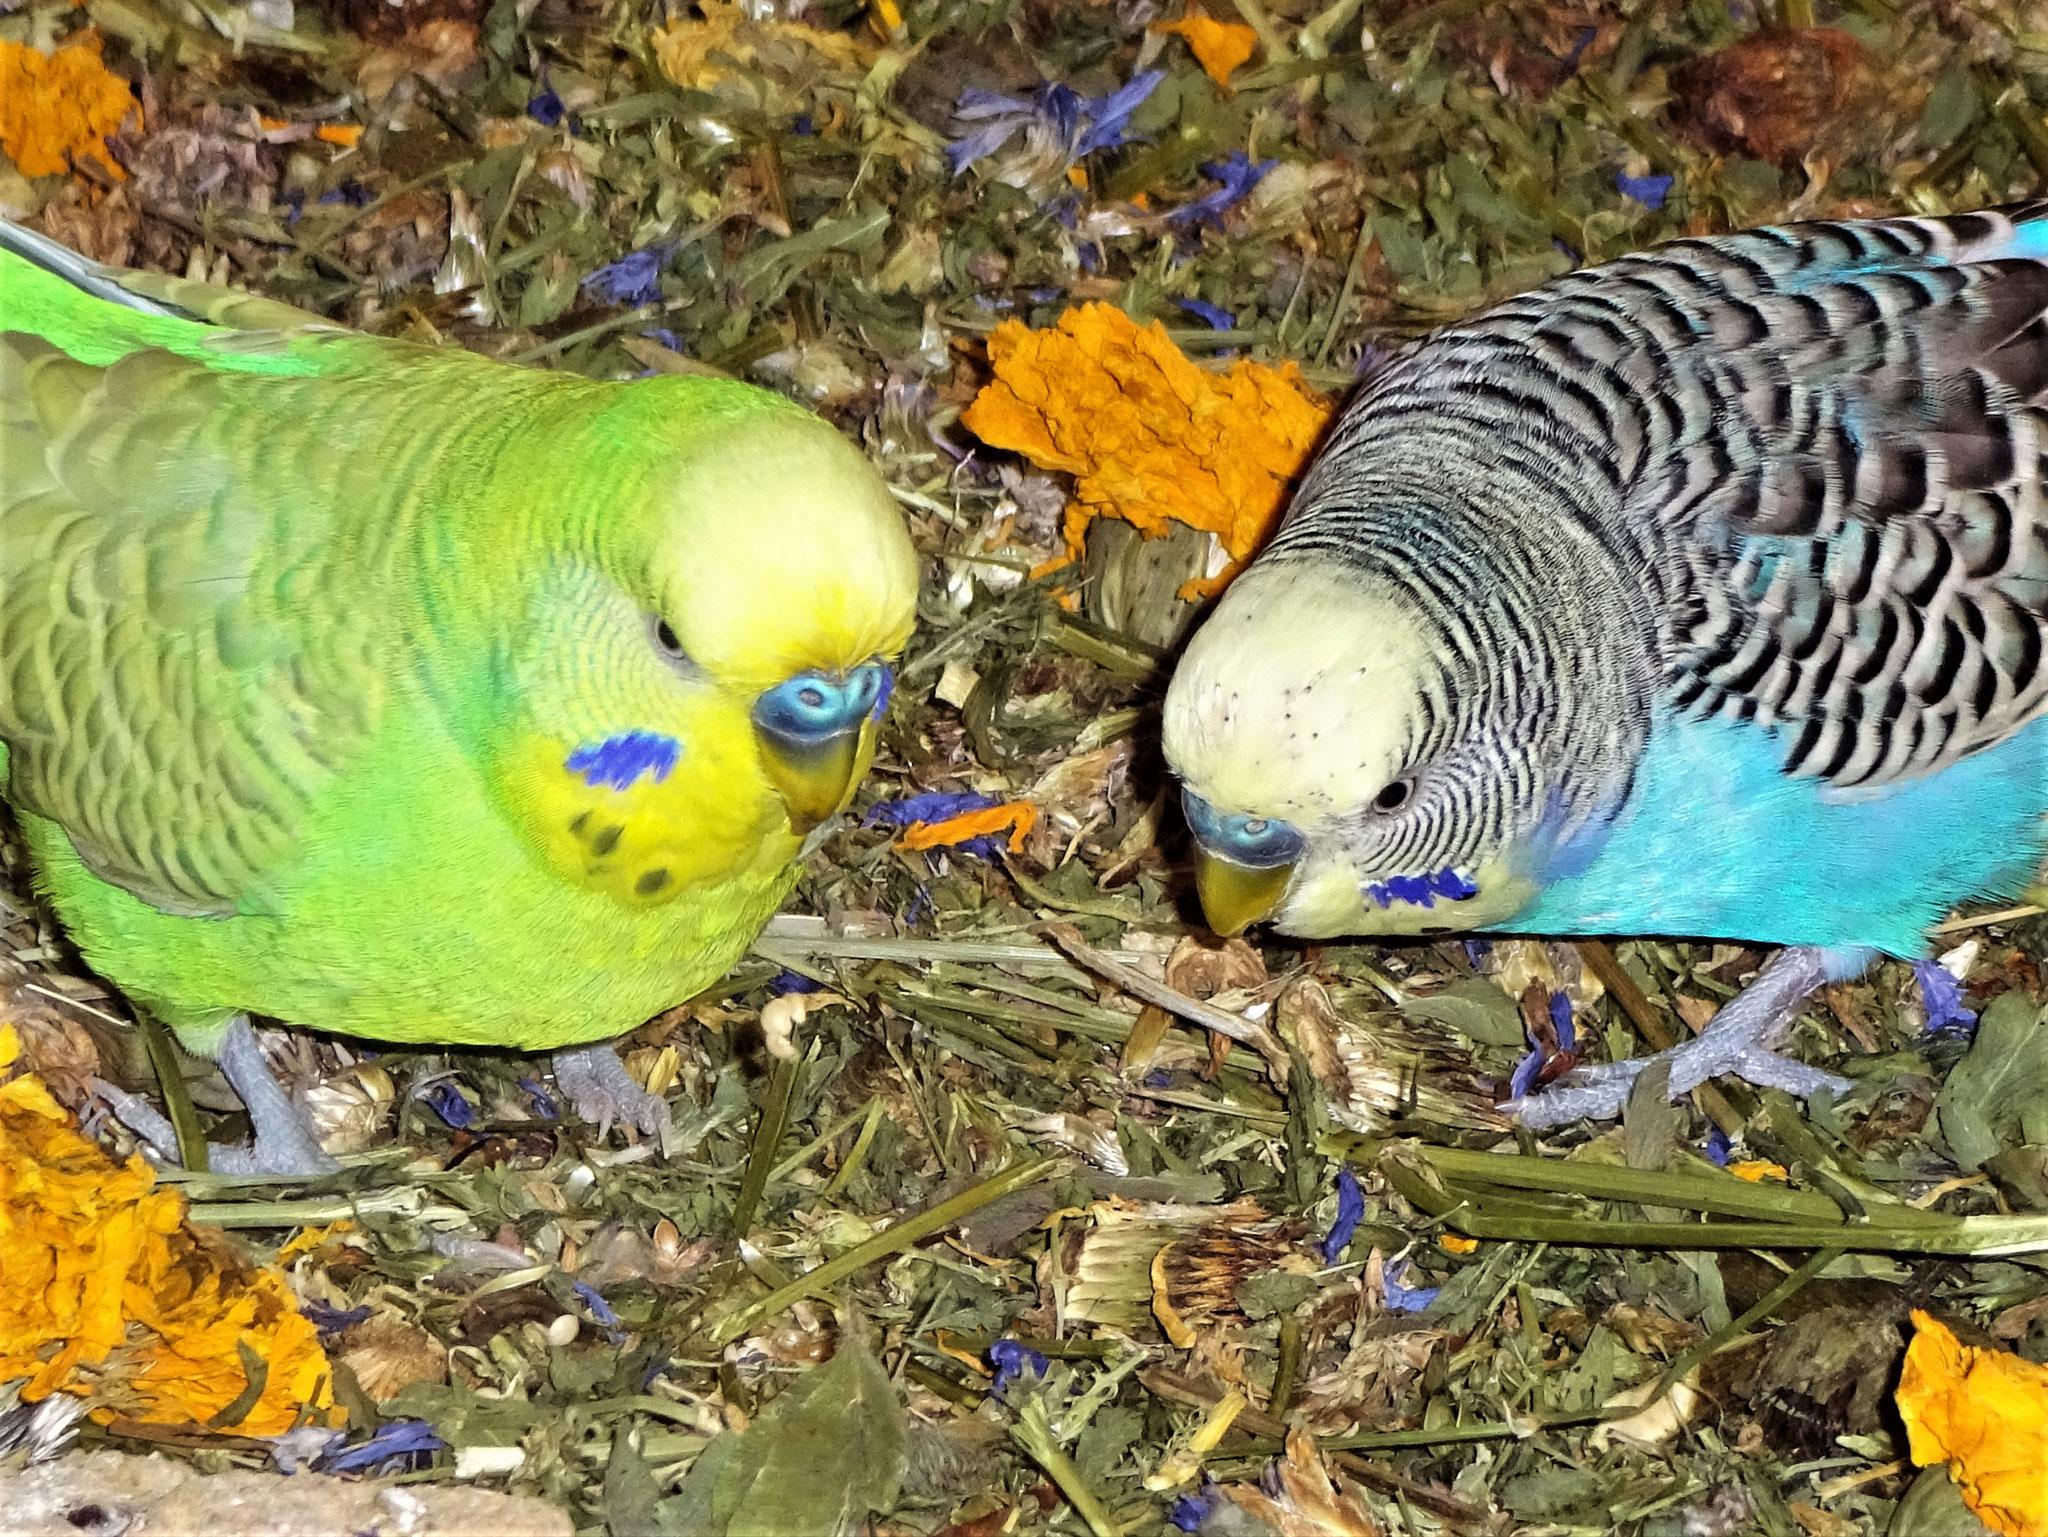 Filou und Jordy